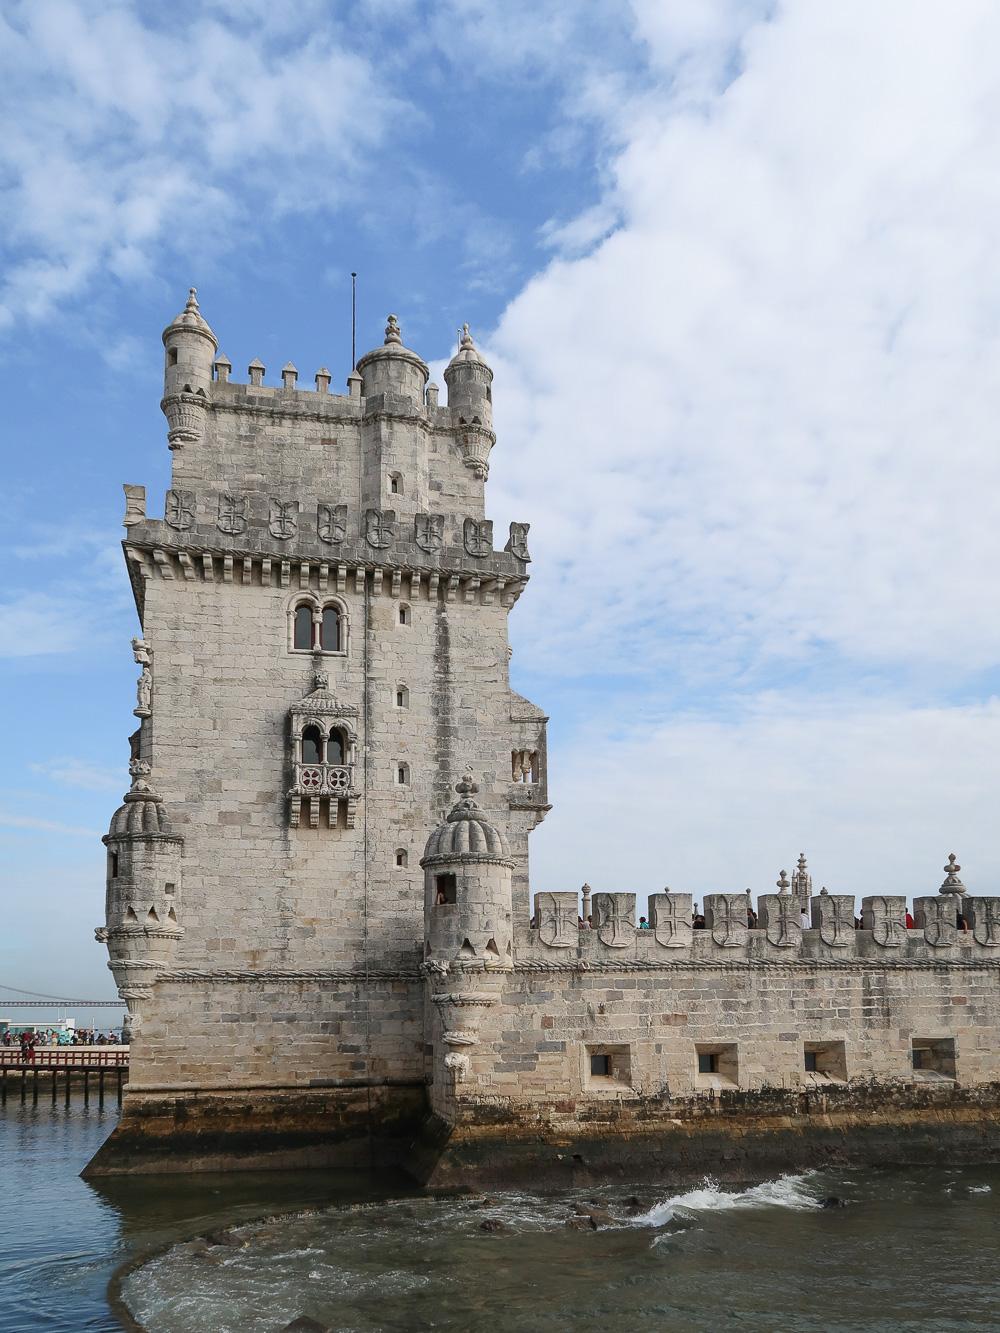 Urlaub-in-Lissabon-Reiseblogger-Influencer-Andrea-Funk-andysparkles-Torre-de-Belem